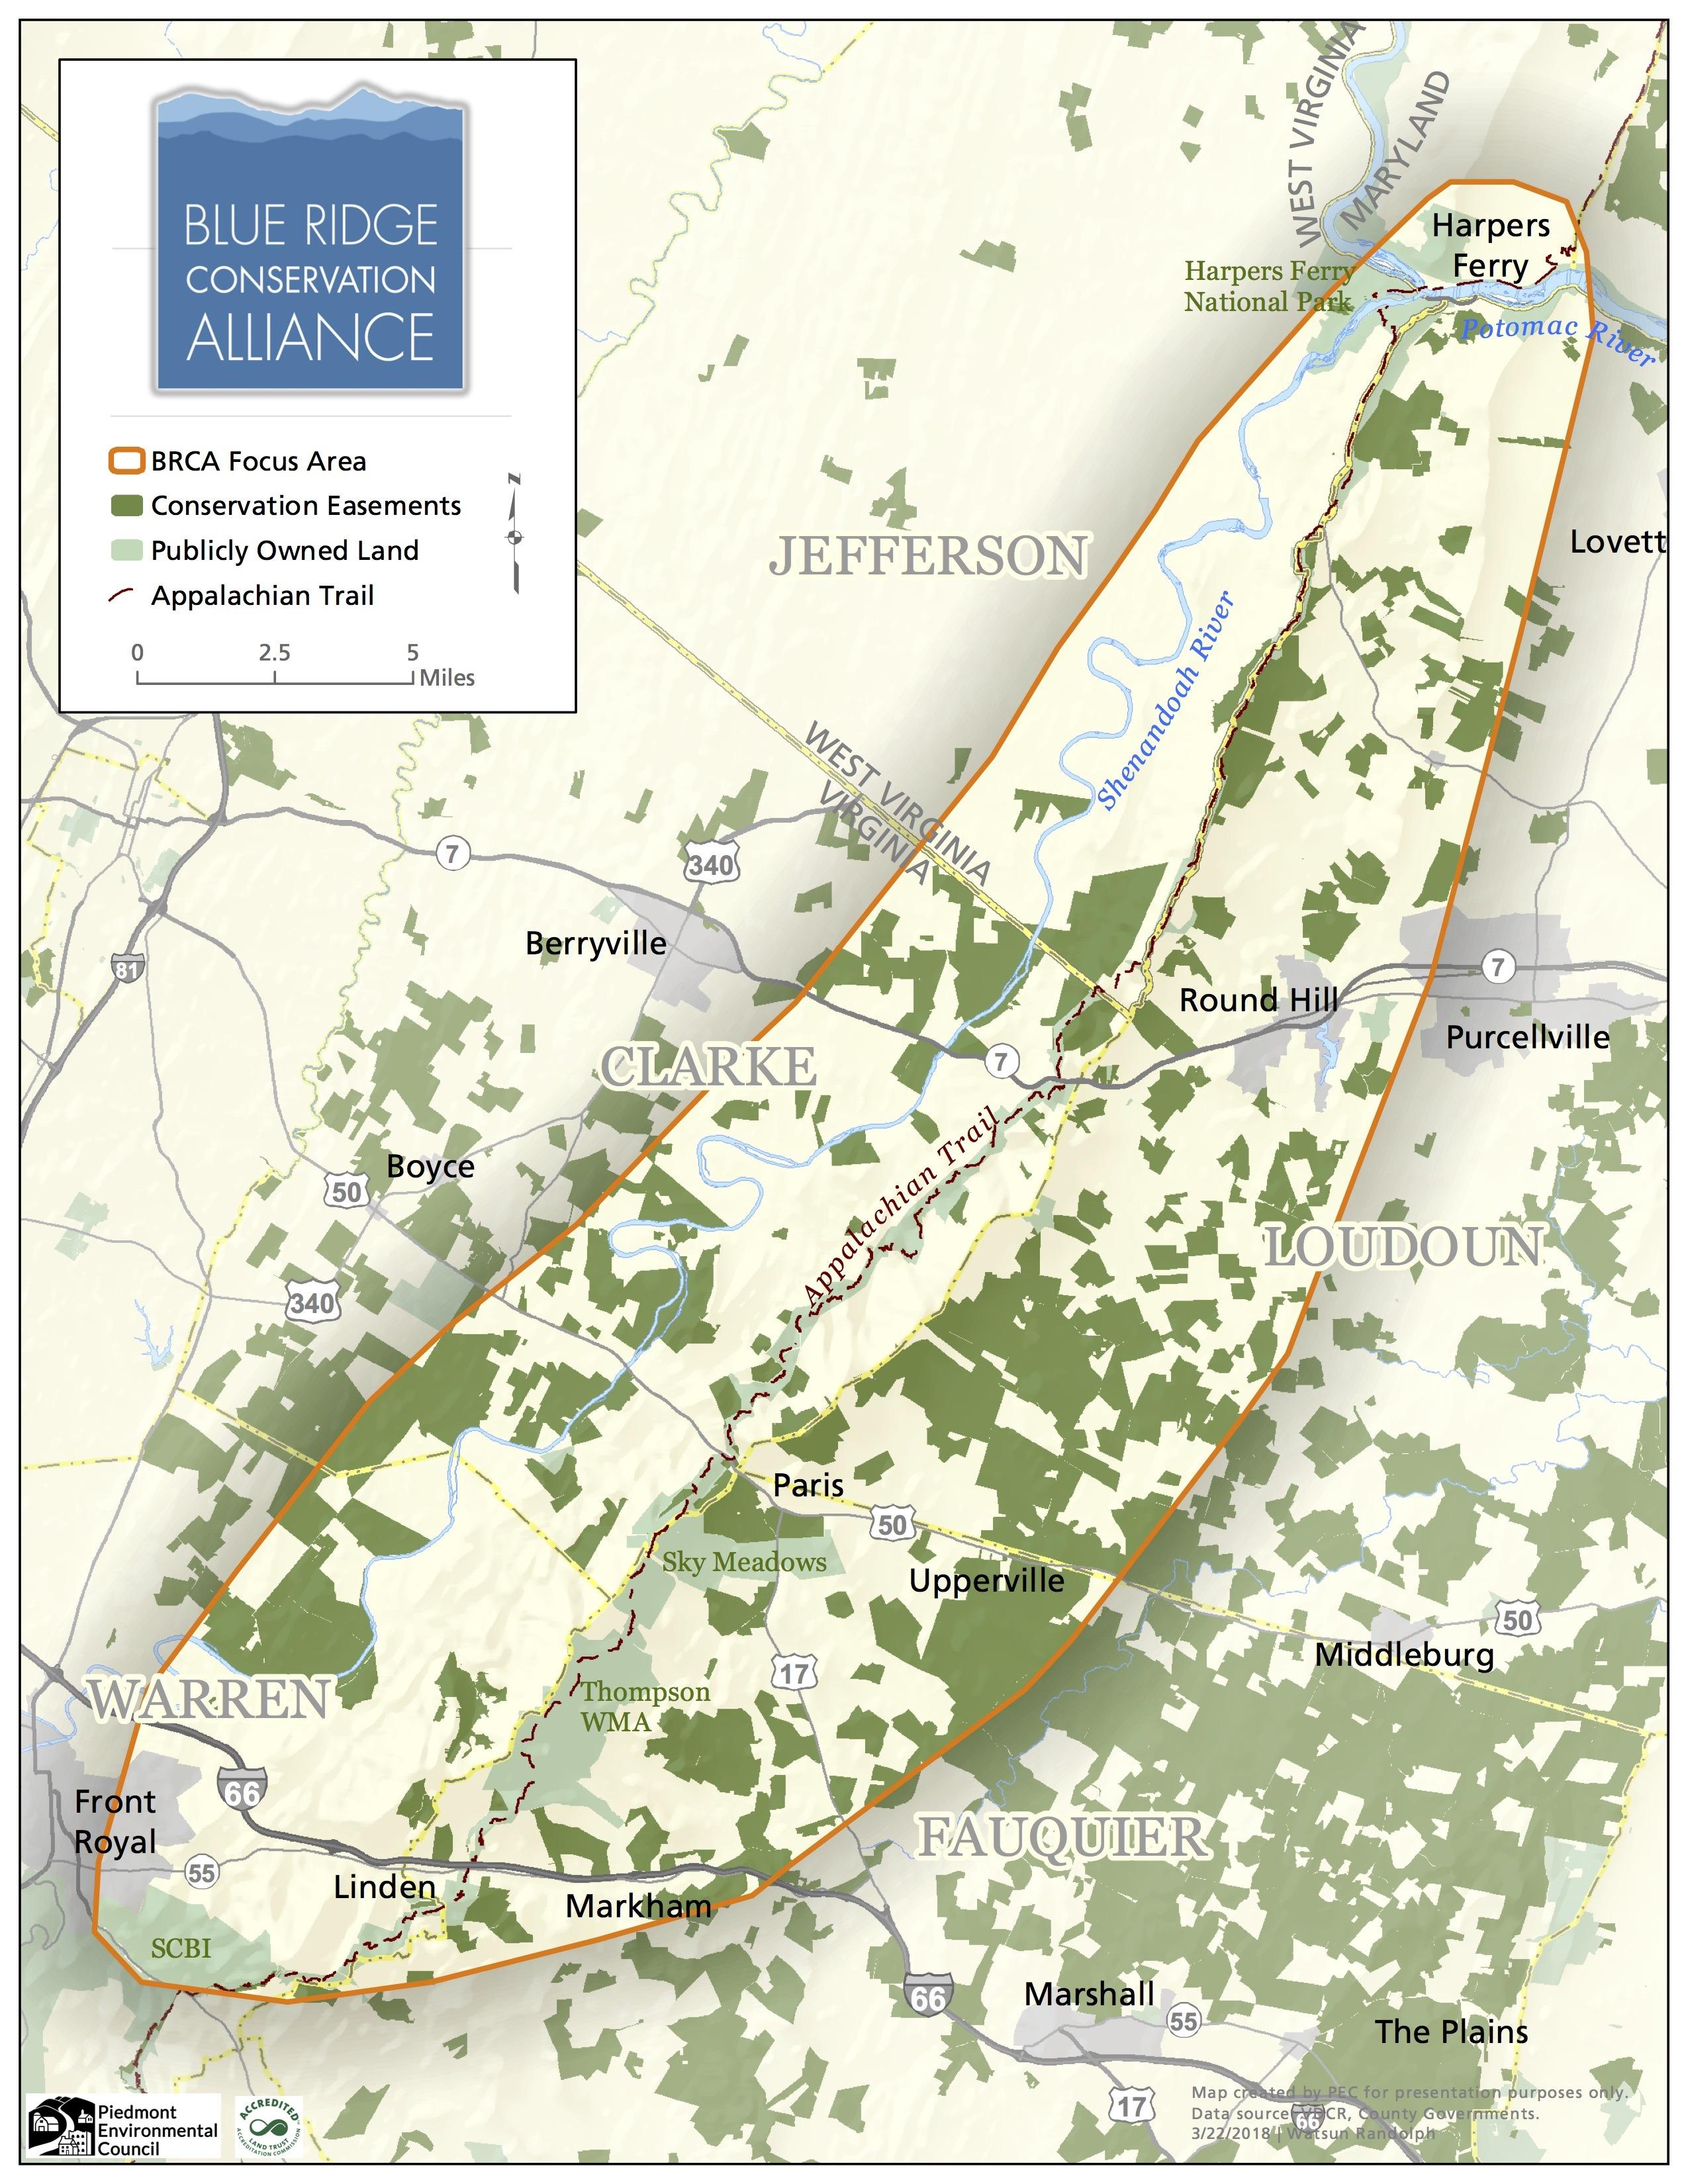 Focus Area Blue Ridge Conservation Alliance